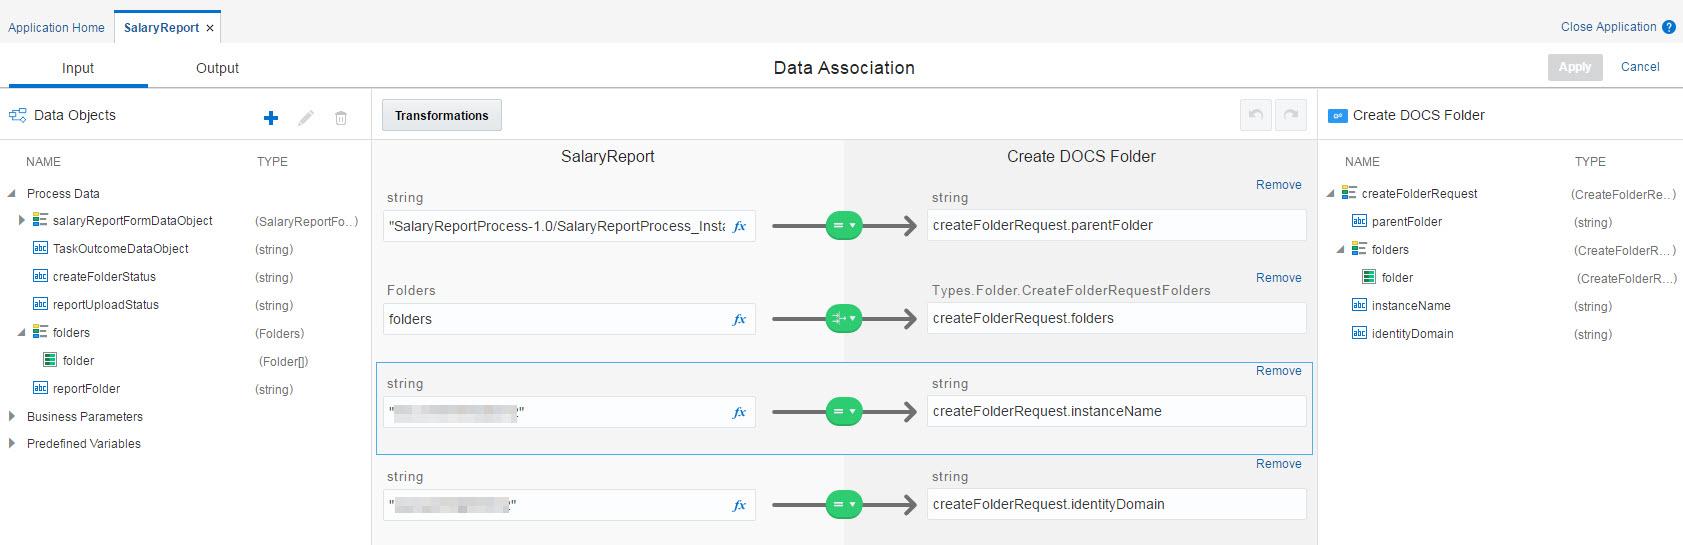 PCS_DOCS_BI_OSB_PCS-CreateDOCSFolder_DataMapping